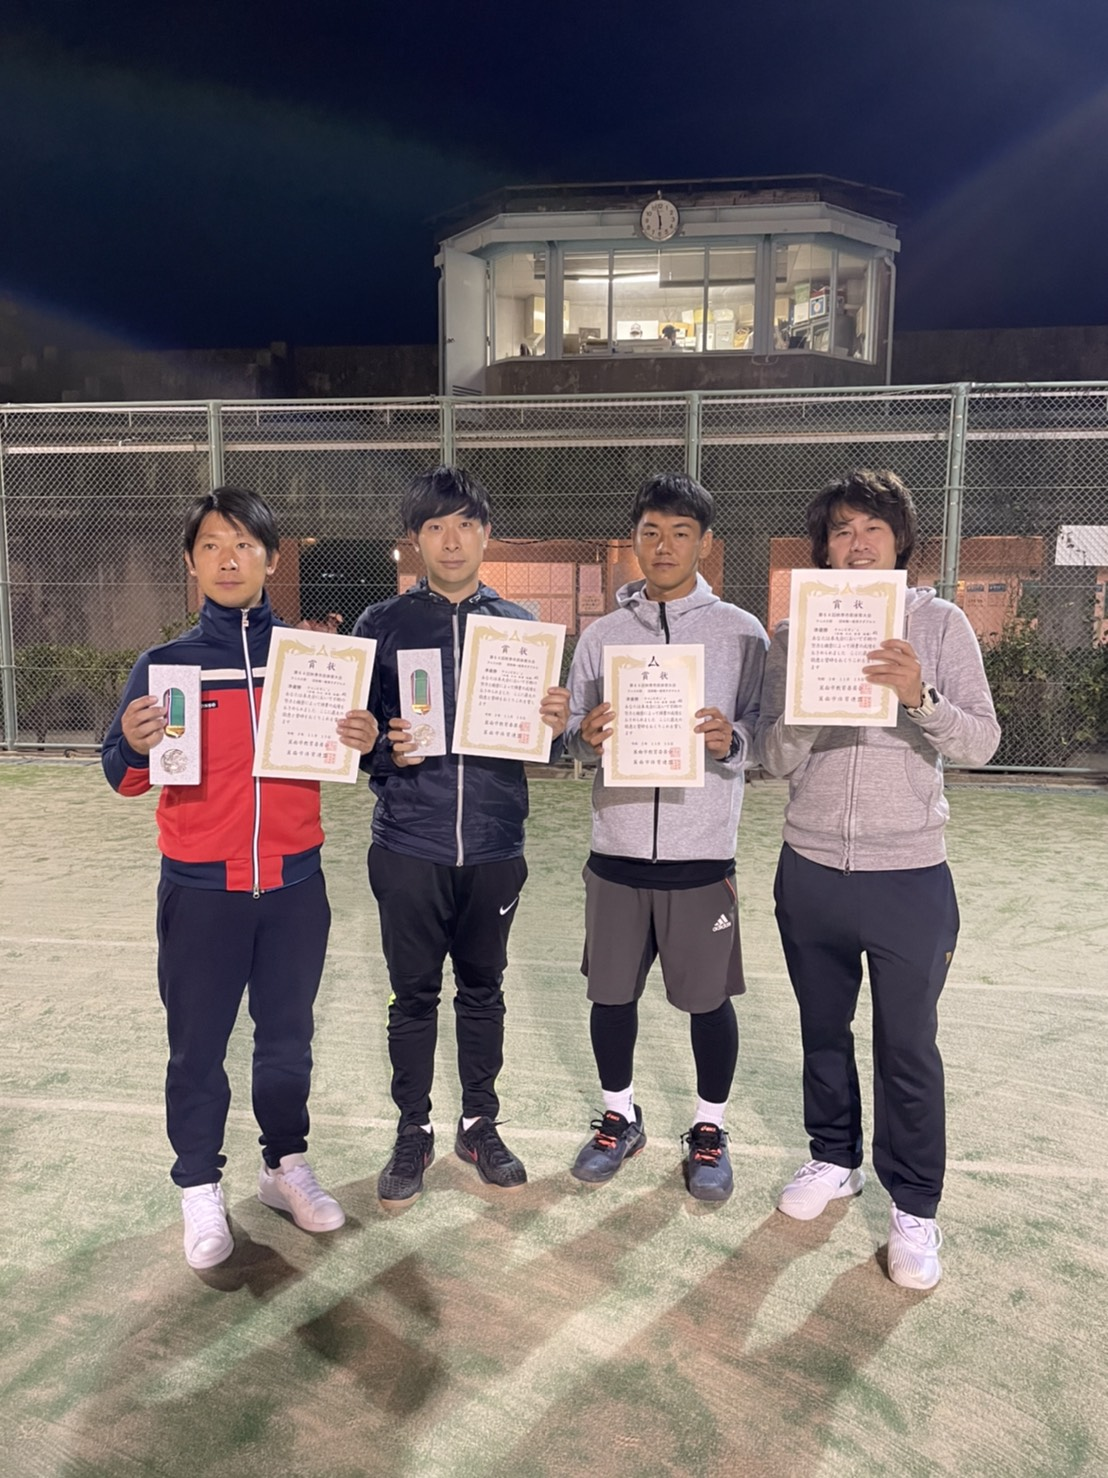 【TEAM STUFF】テニスチーム団体戦好成績!!